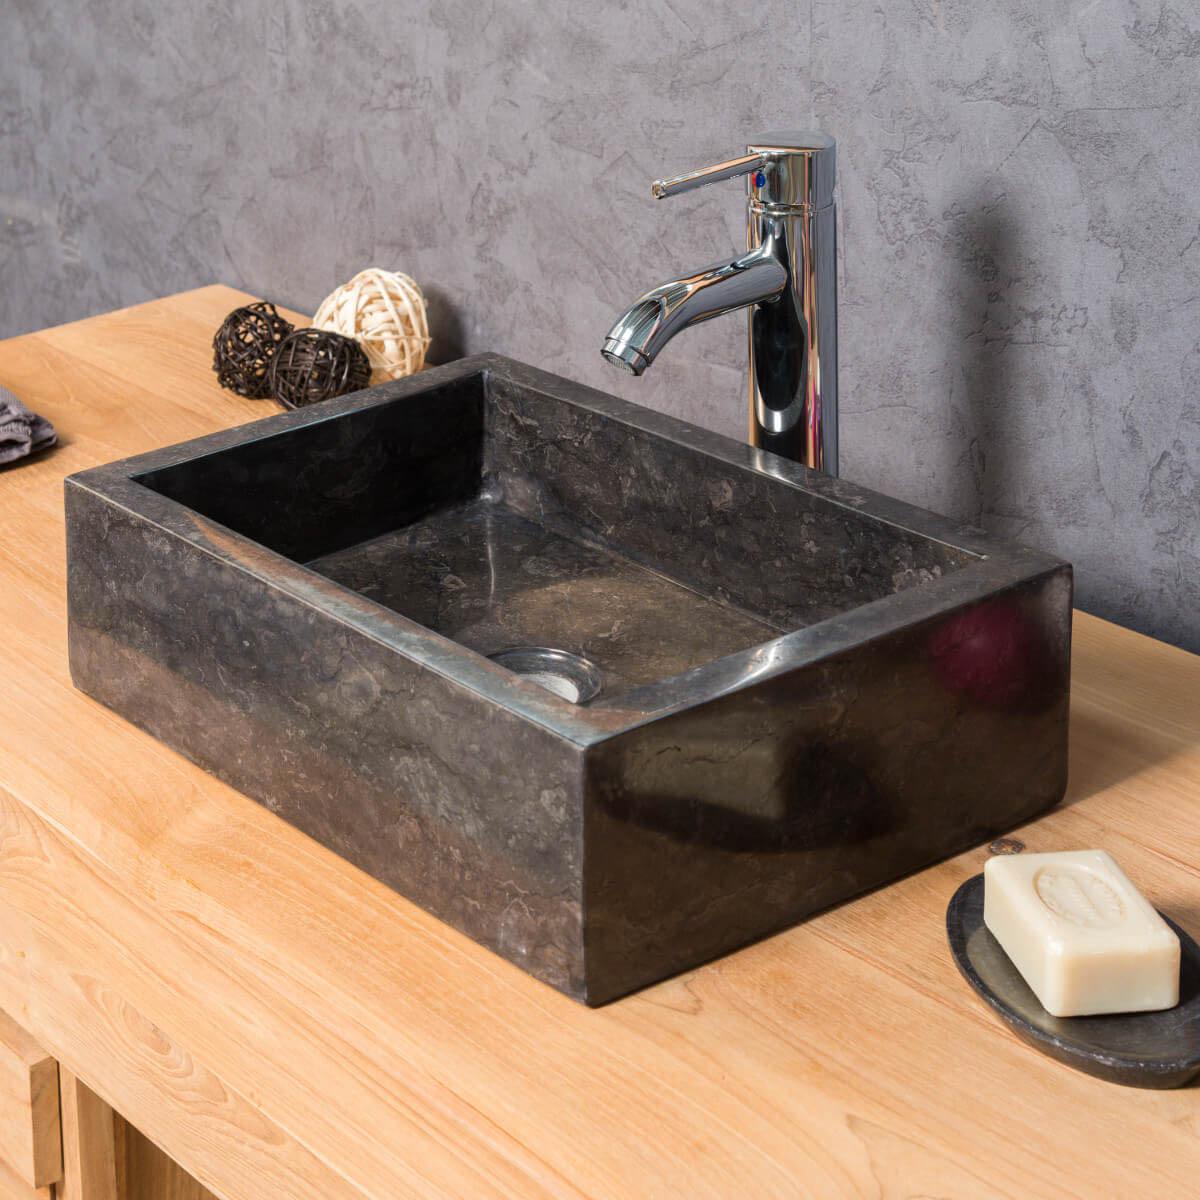 vasque salle de bain poser milan rectangle 30cm x 40cm noir. Black Bedroom Furniture Sets. Home Design Ideas